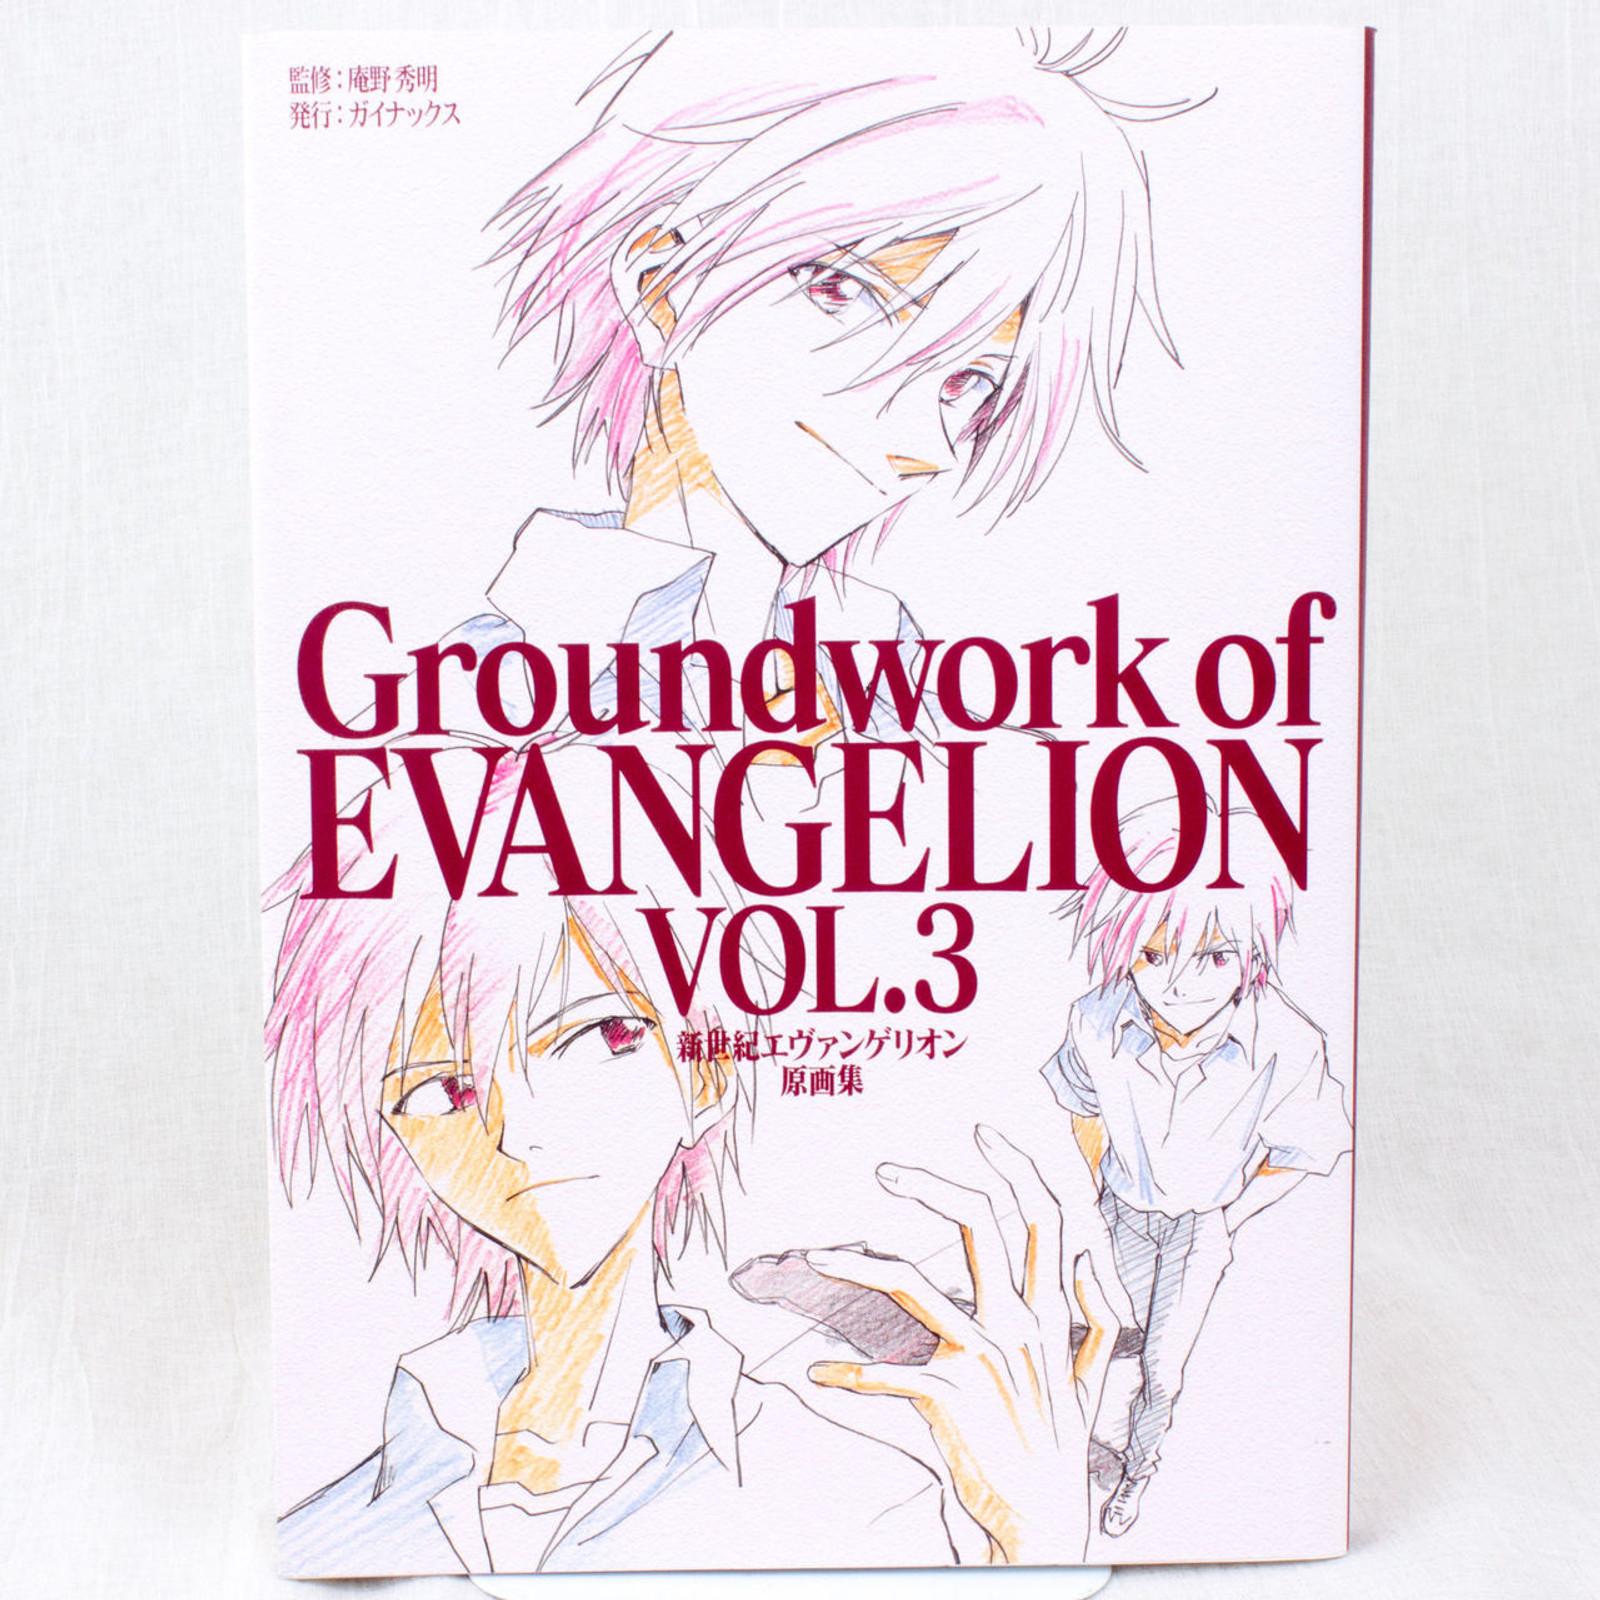 Groundwork of Evangelion Vol.03 Original Picture Art Book JAPAN ANIME MANGA